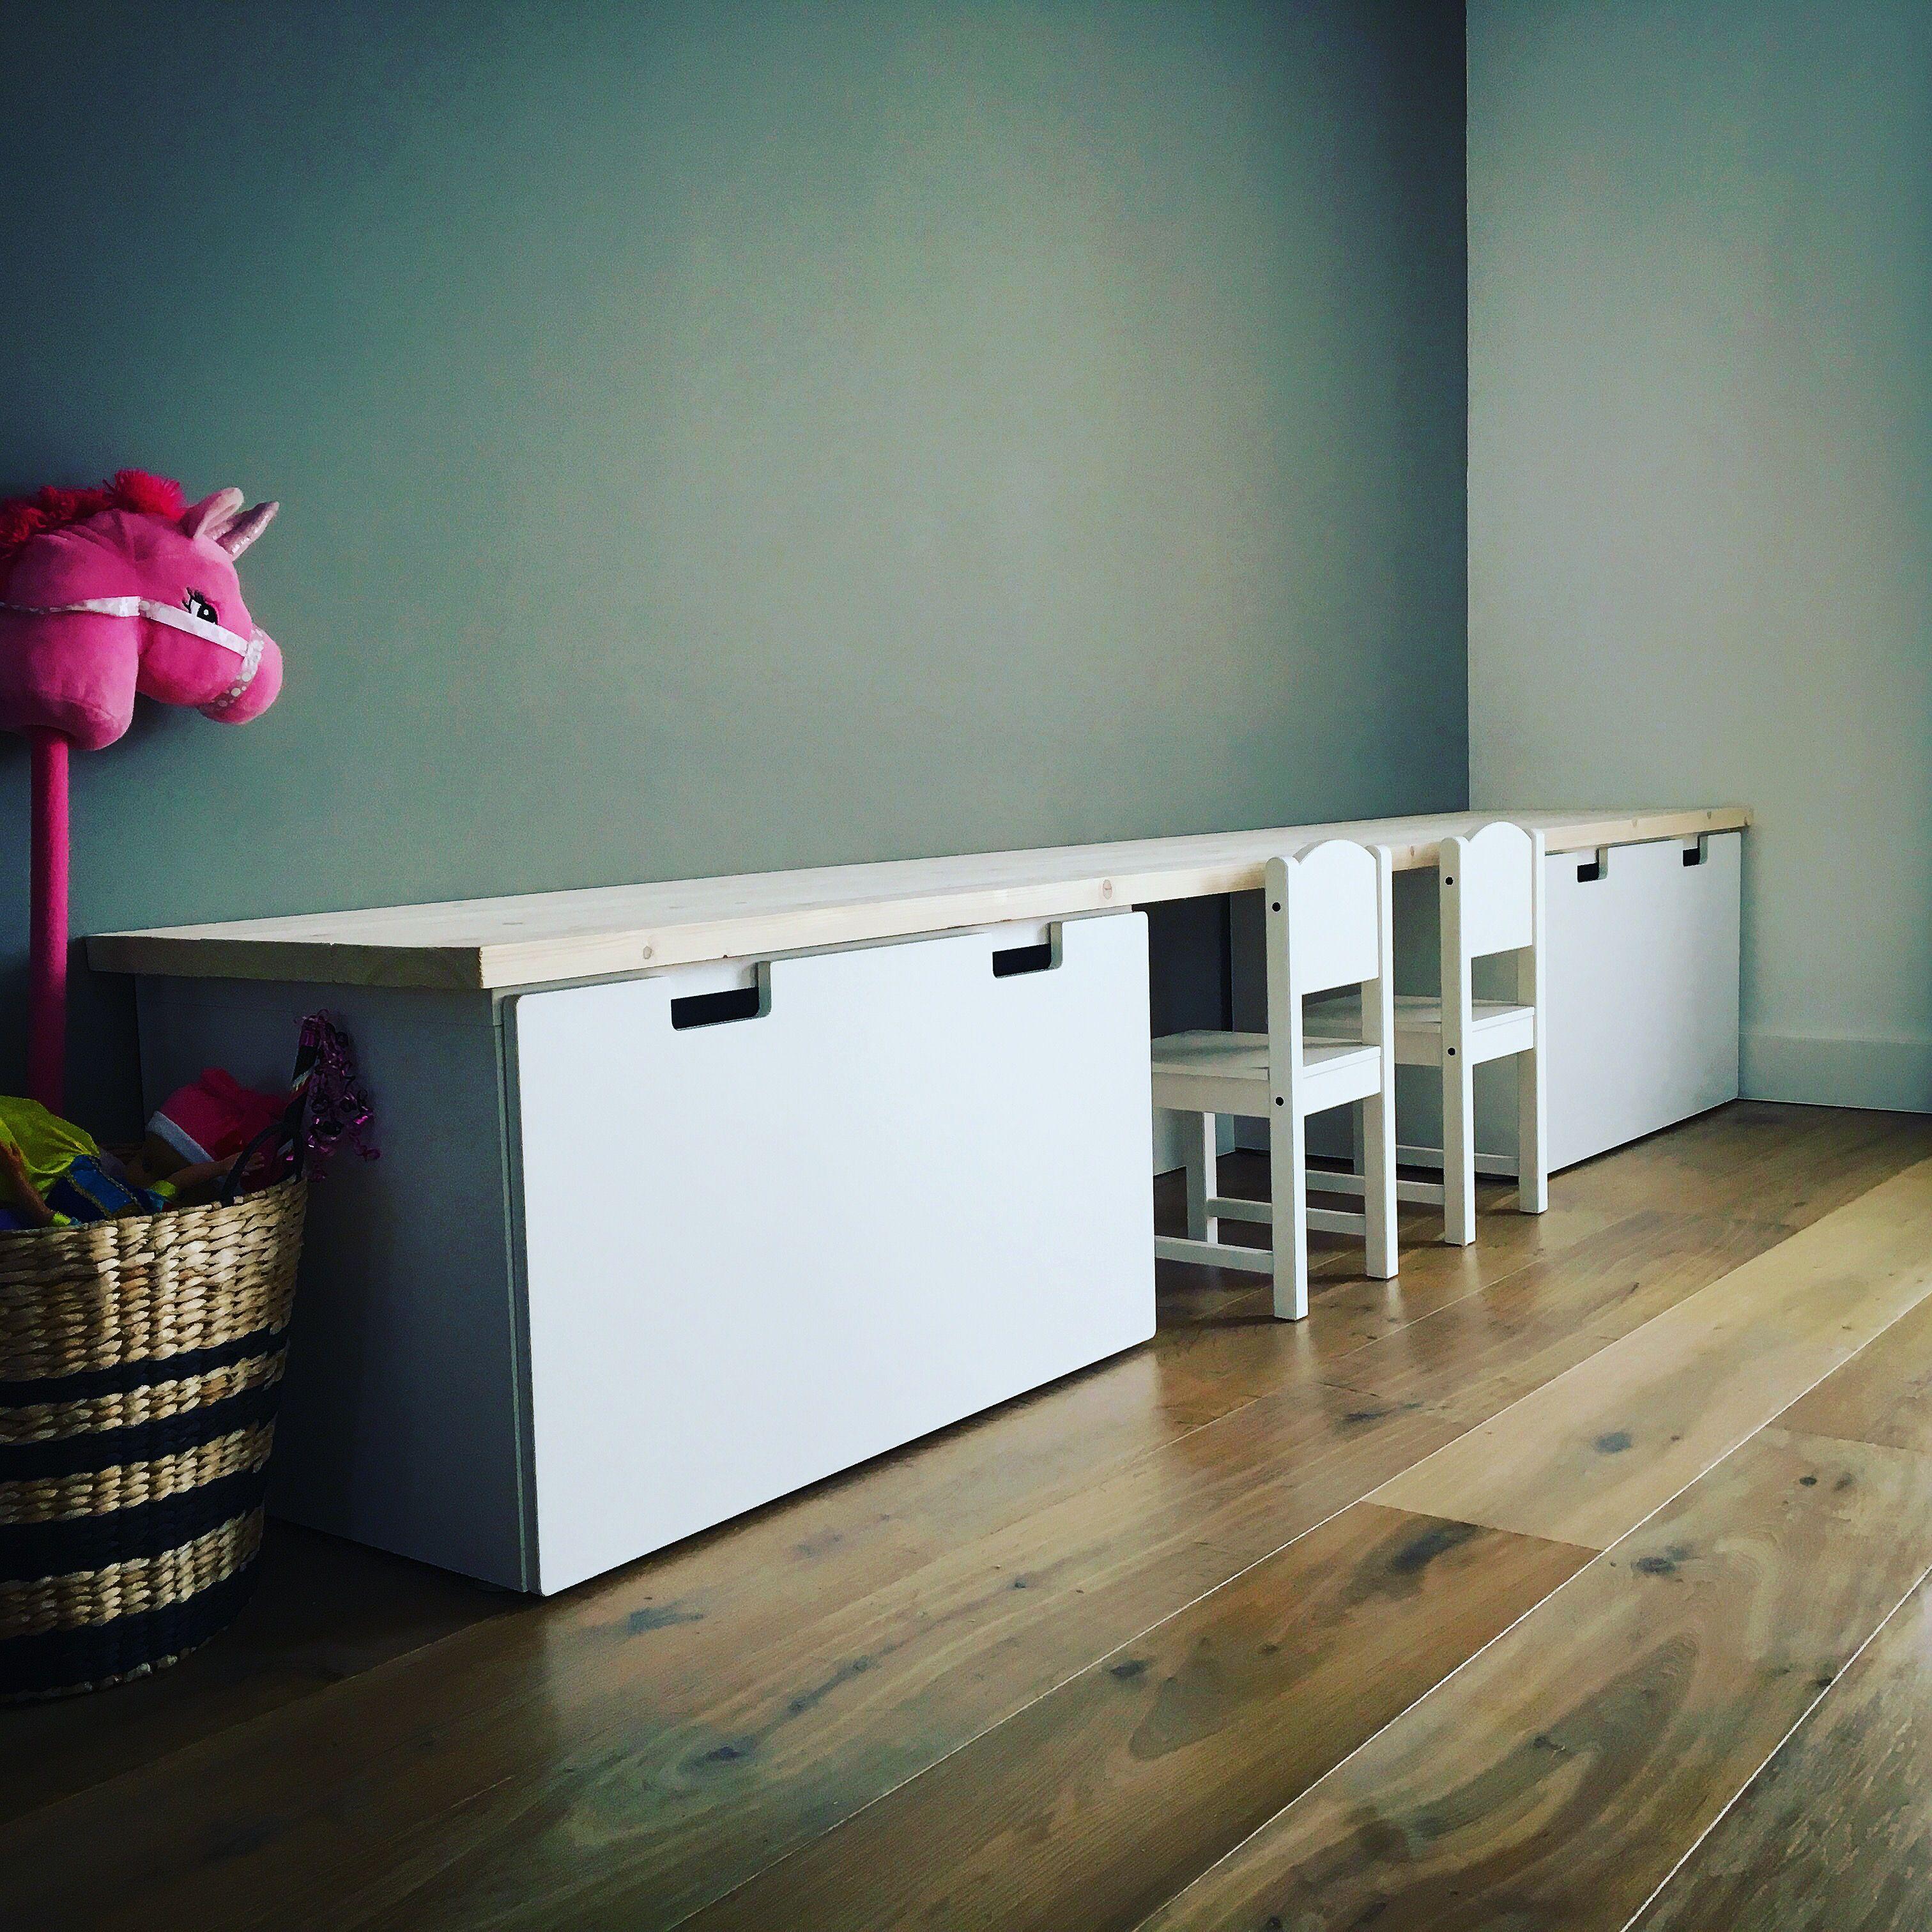 #Play #Furniture #Home #Renovation #Construction #Styling #Ikea #Ikeastuva